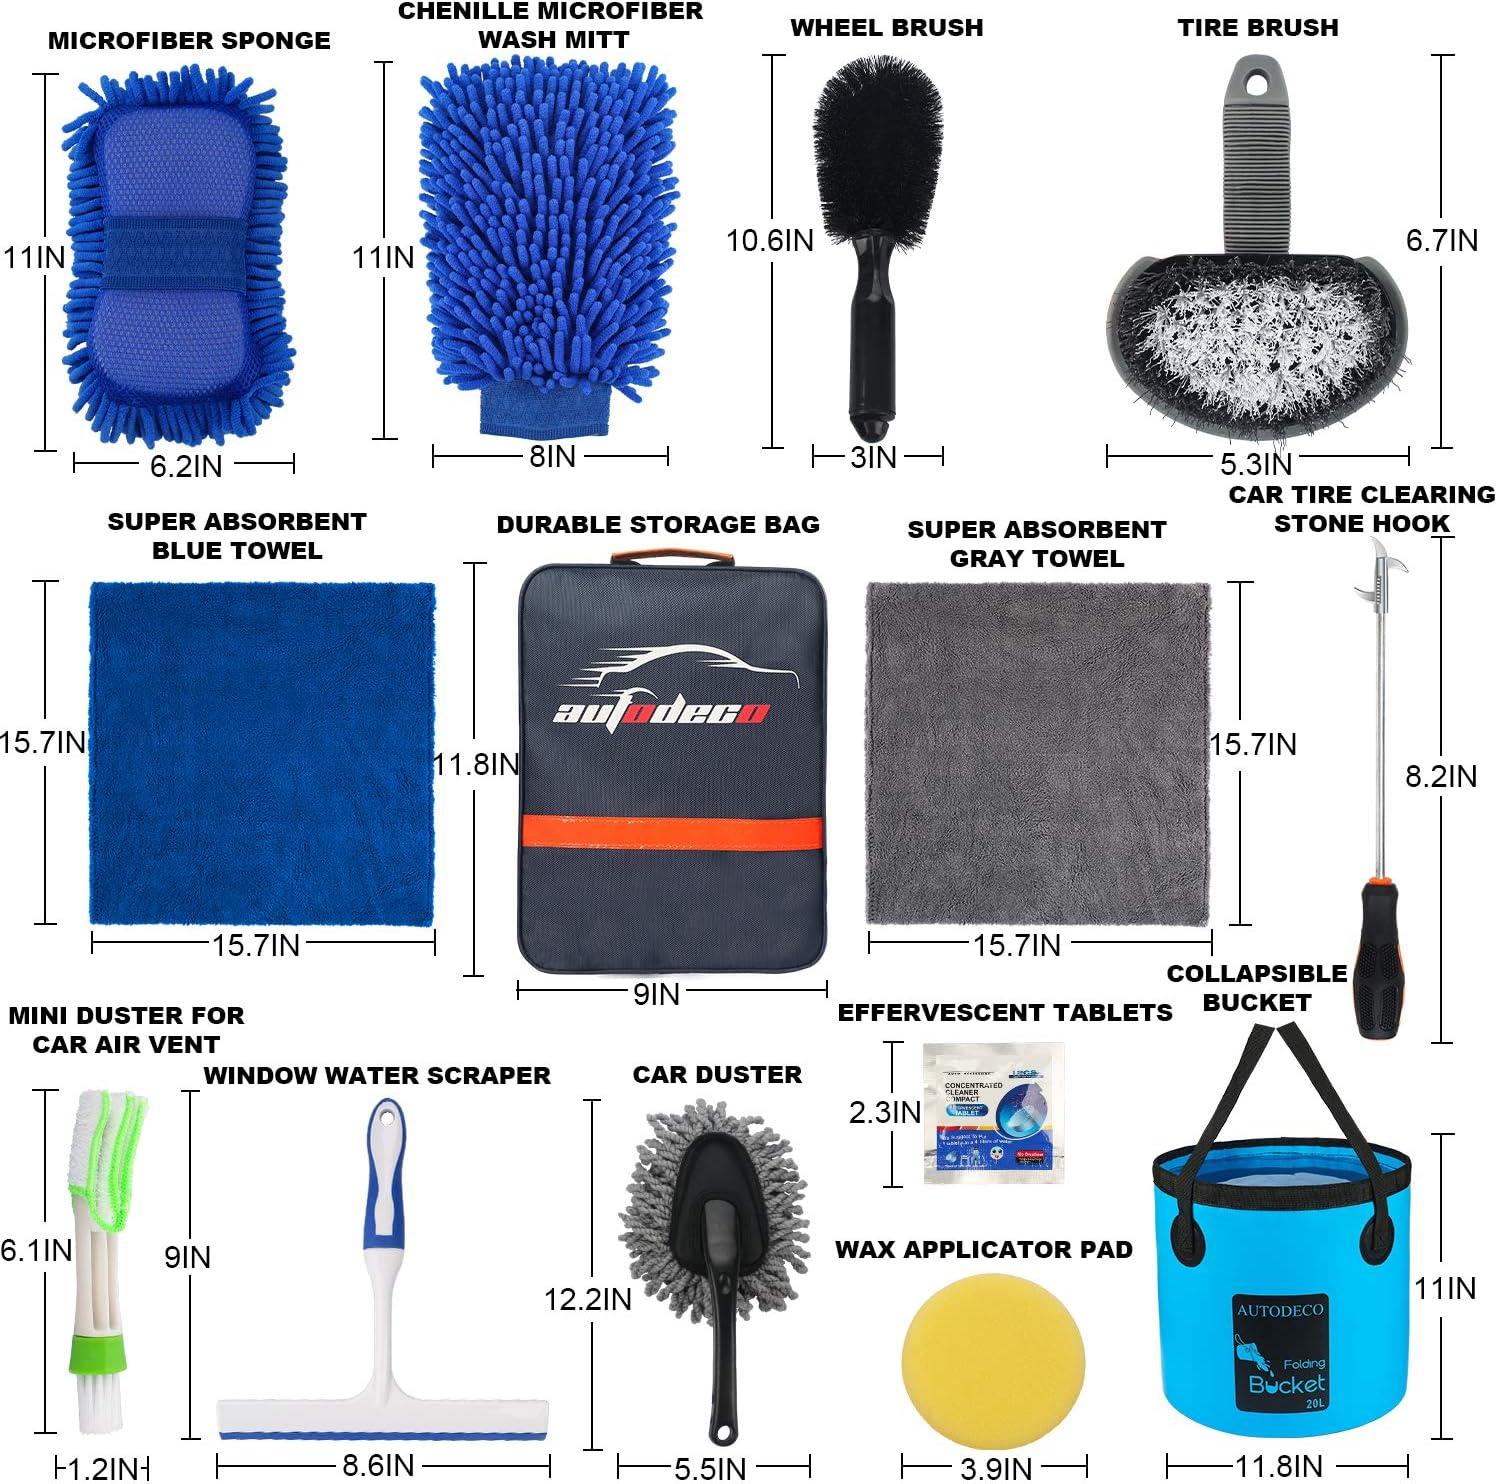 AUTODECO 15Pcs Car Wash Cleaning Tools Kit Set Chenille Microfiber Wash Mitt Sponge Gloves Towels Applicator Pads Wheel Brush Window Water Scraper Air Vent Duster Tire Clearing Stone Hook Car Care Kit